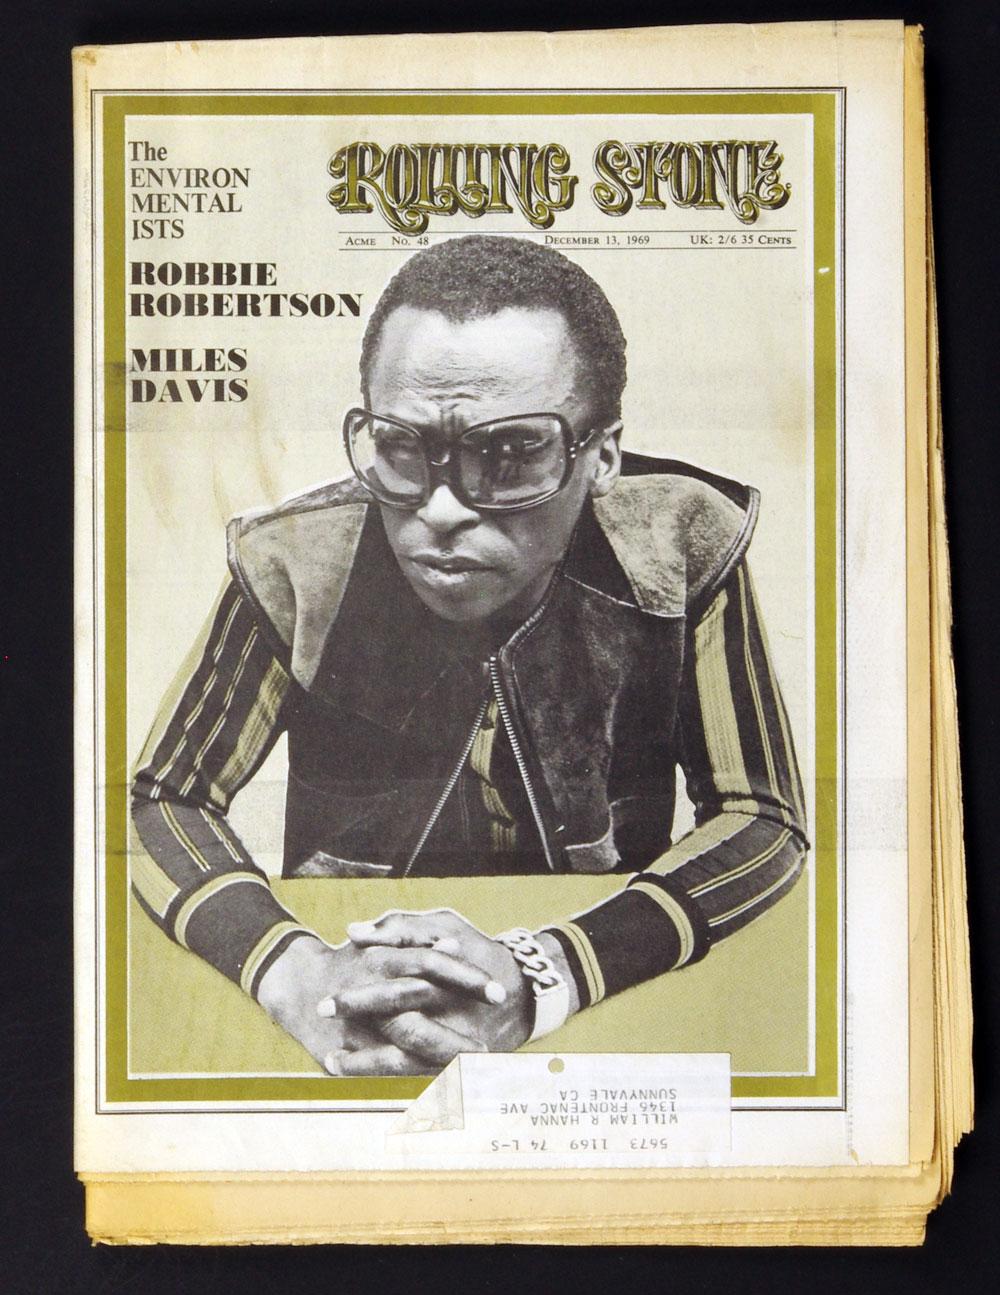 Rolling Stone Magazine 1969 Dec 13 No. 48 Miles Davis